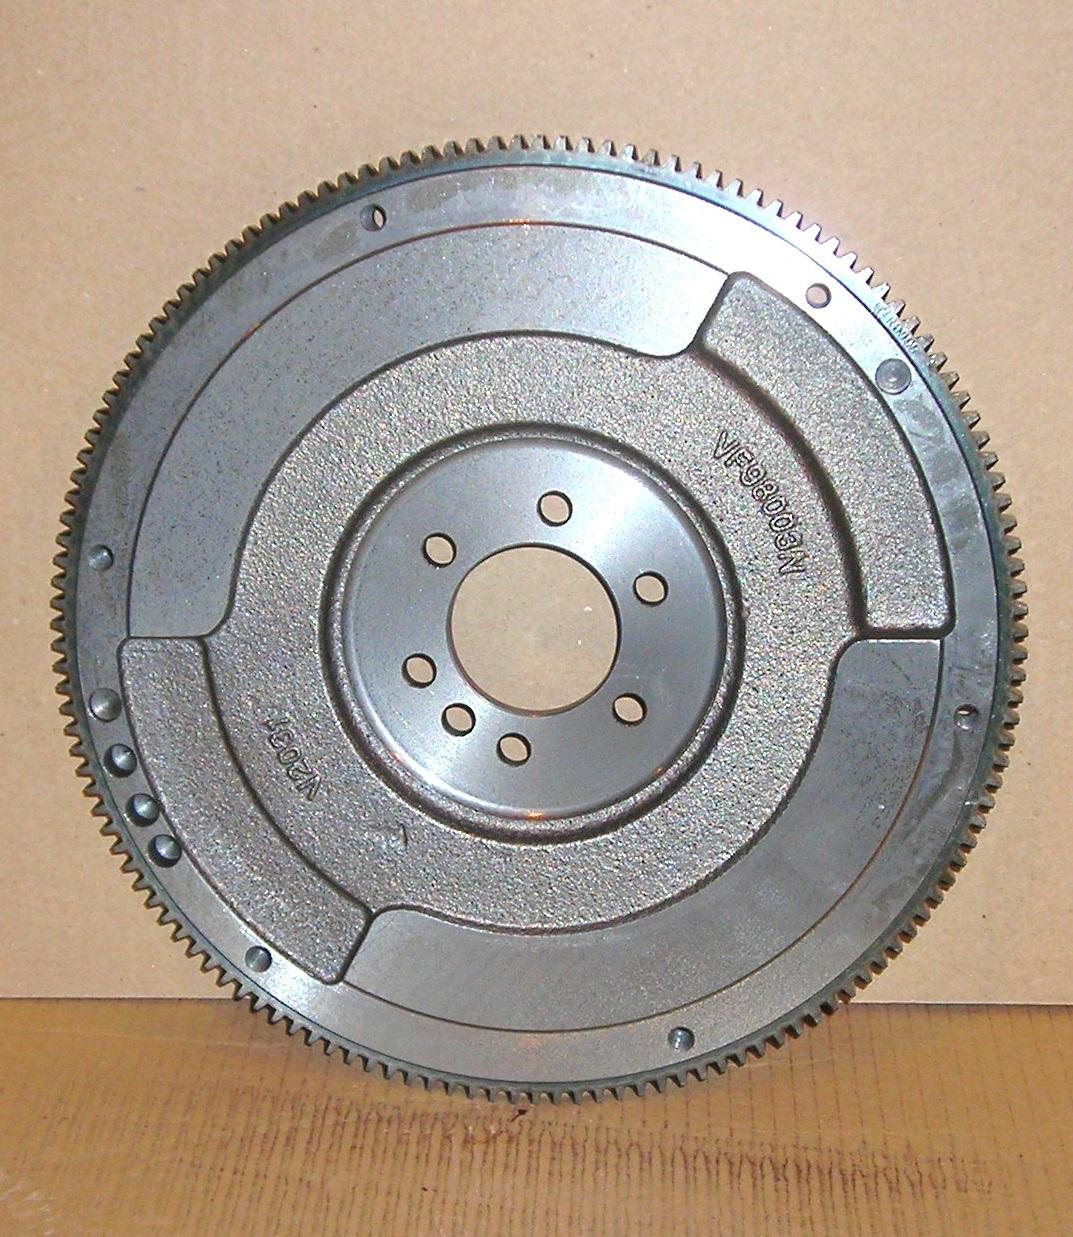 12556799 GM Medium Duty Flywheel Rear View - fixed